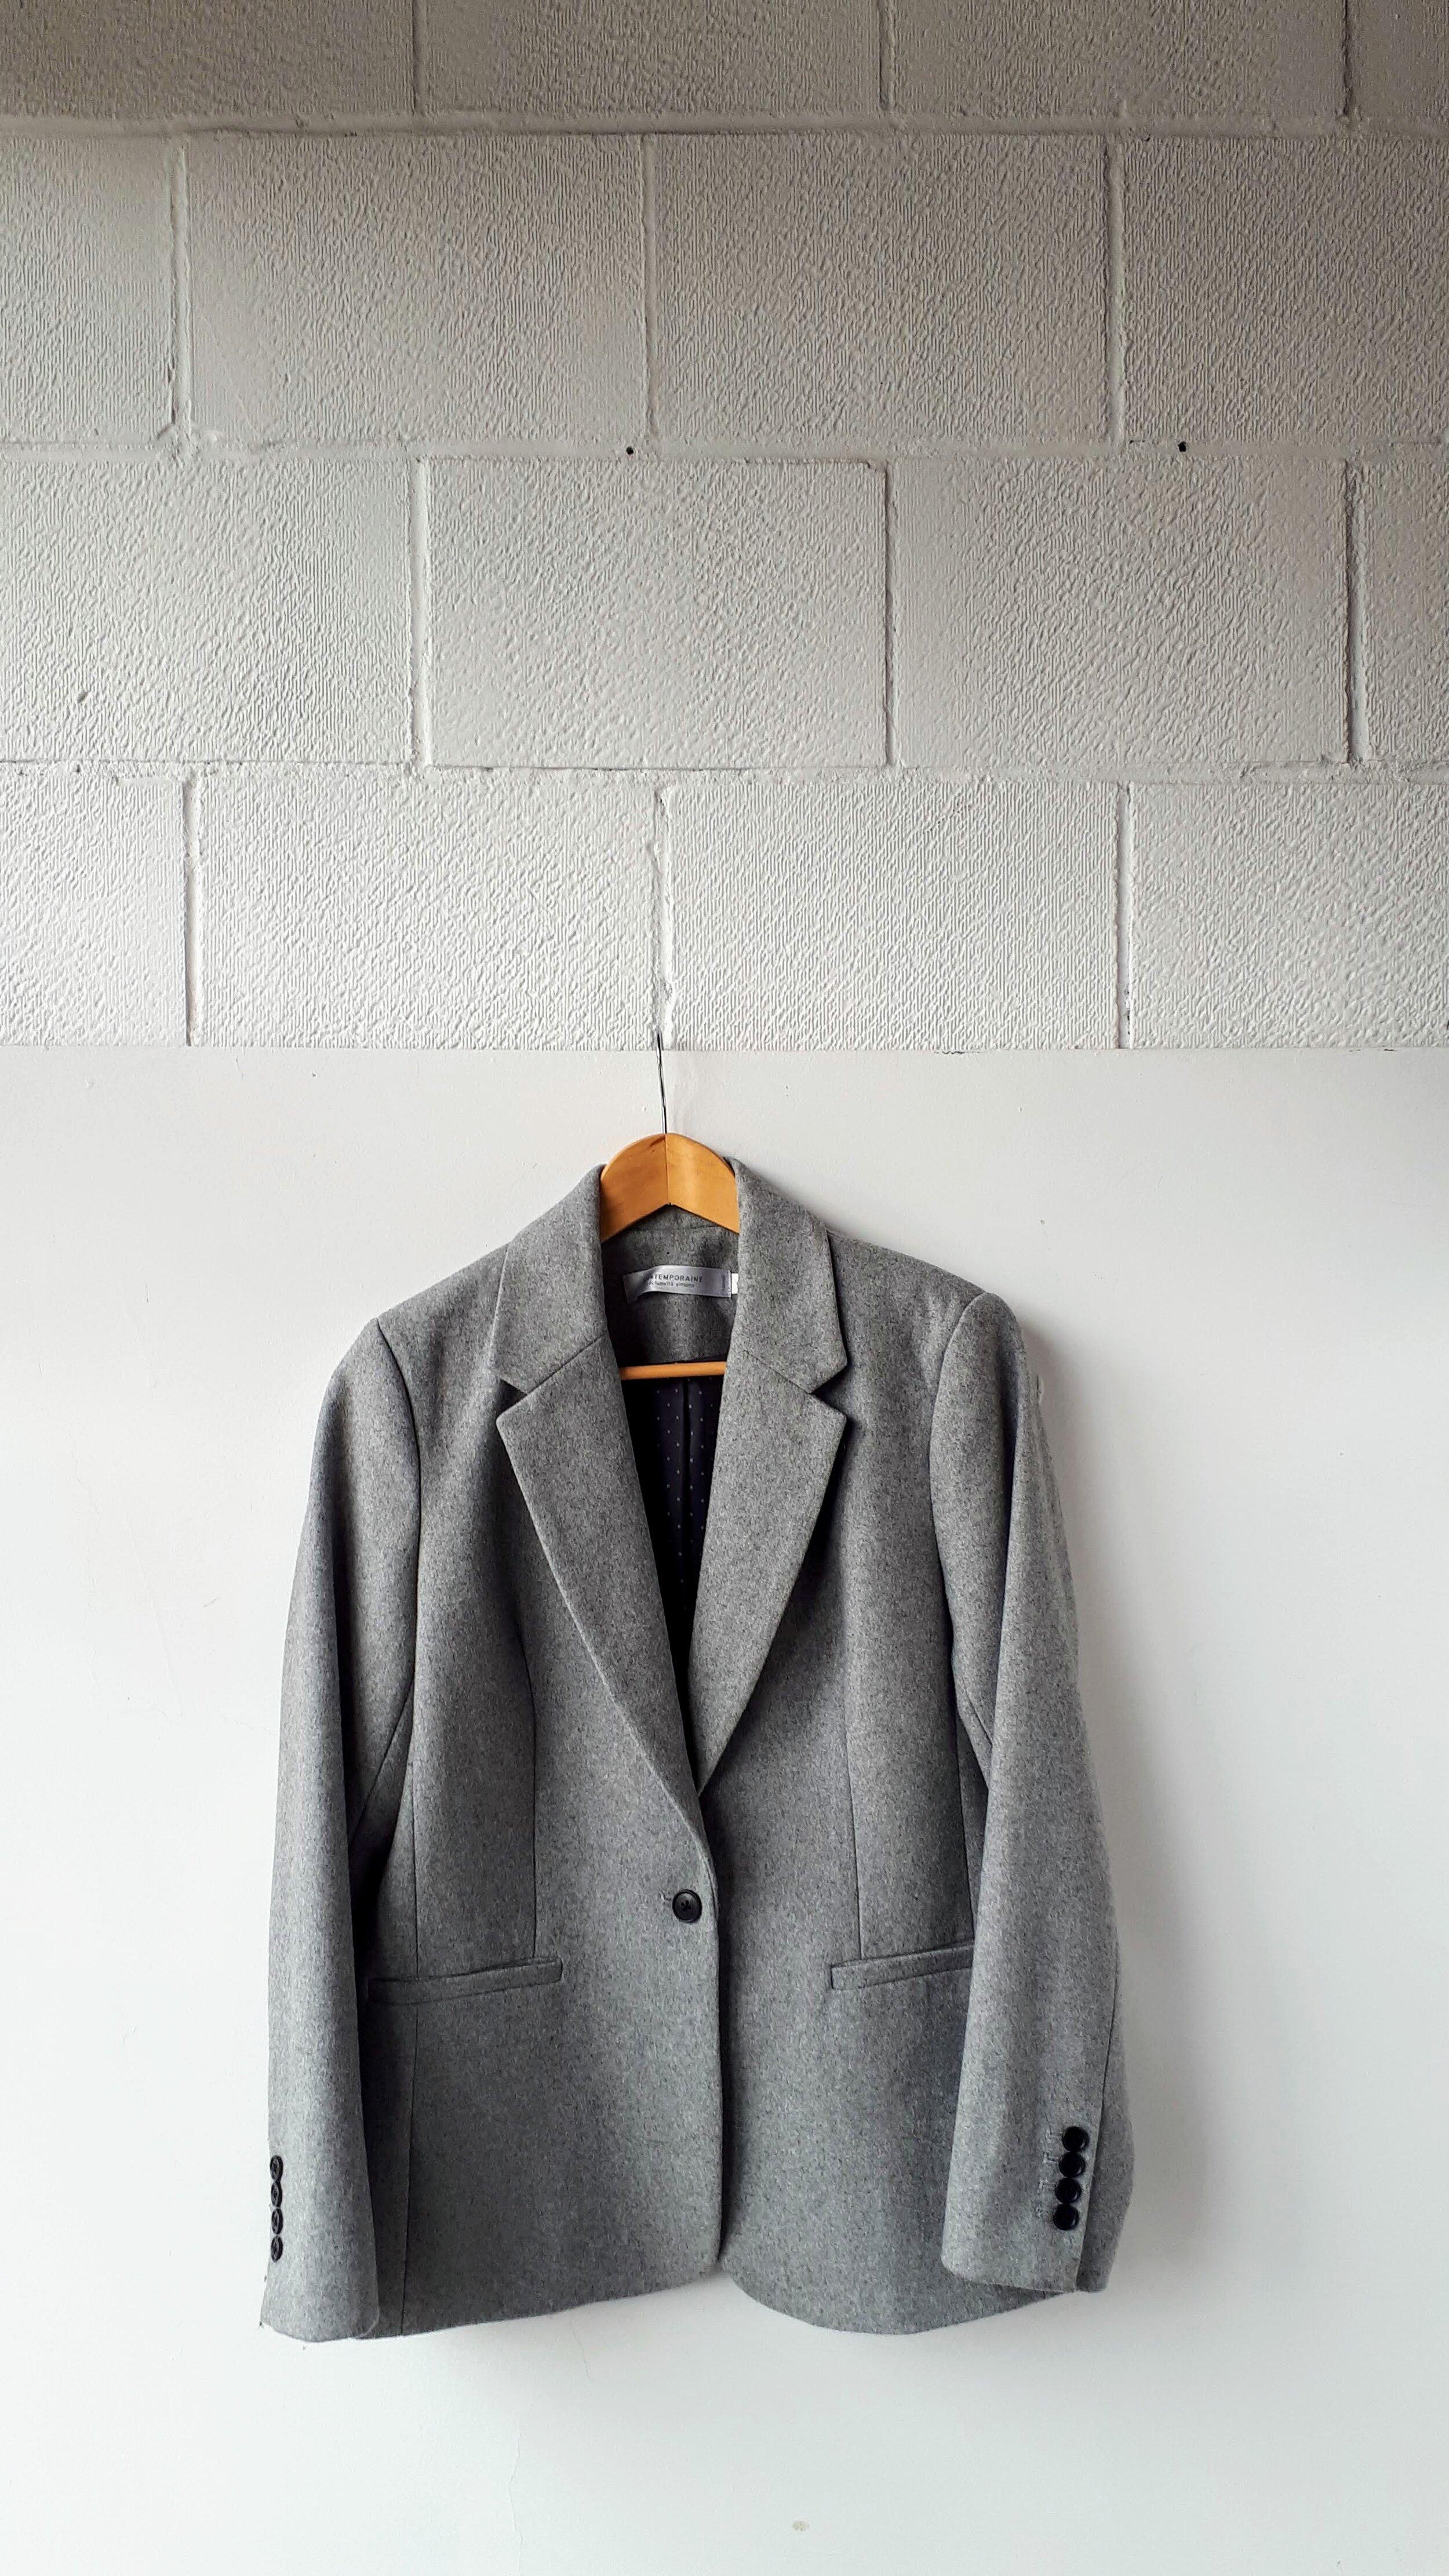 Contemporaine blazer; Size 8, $42 (on sale for $21!)